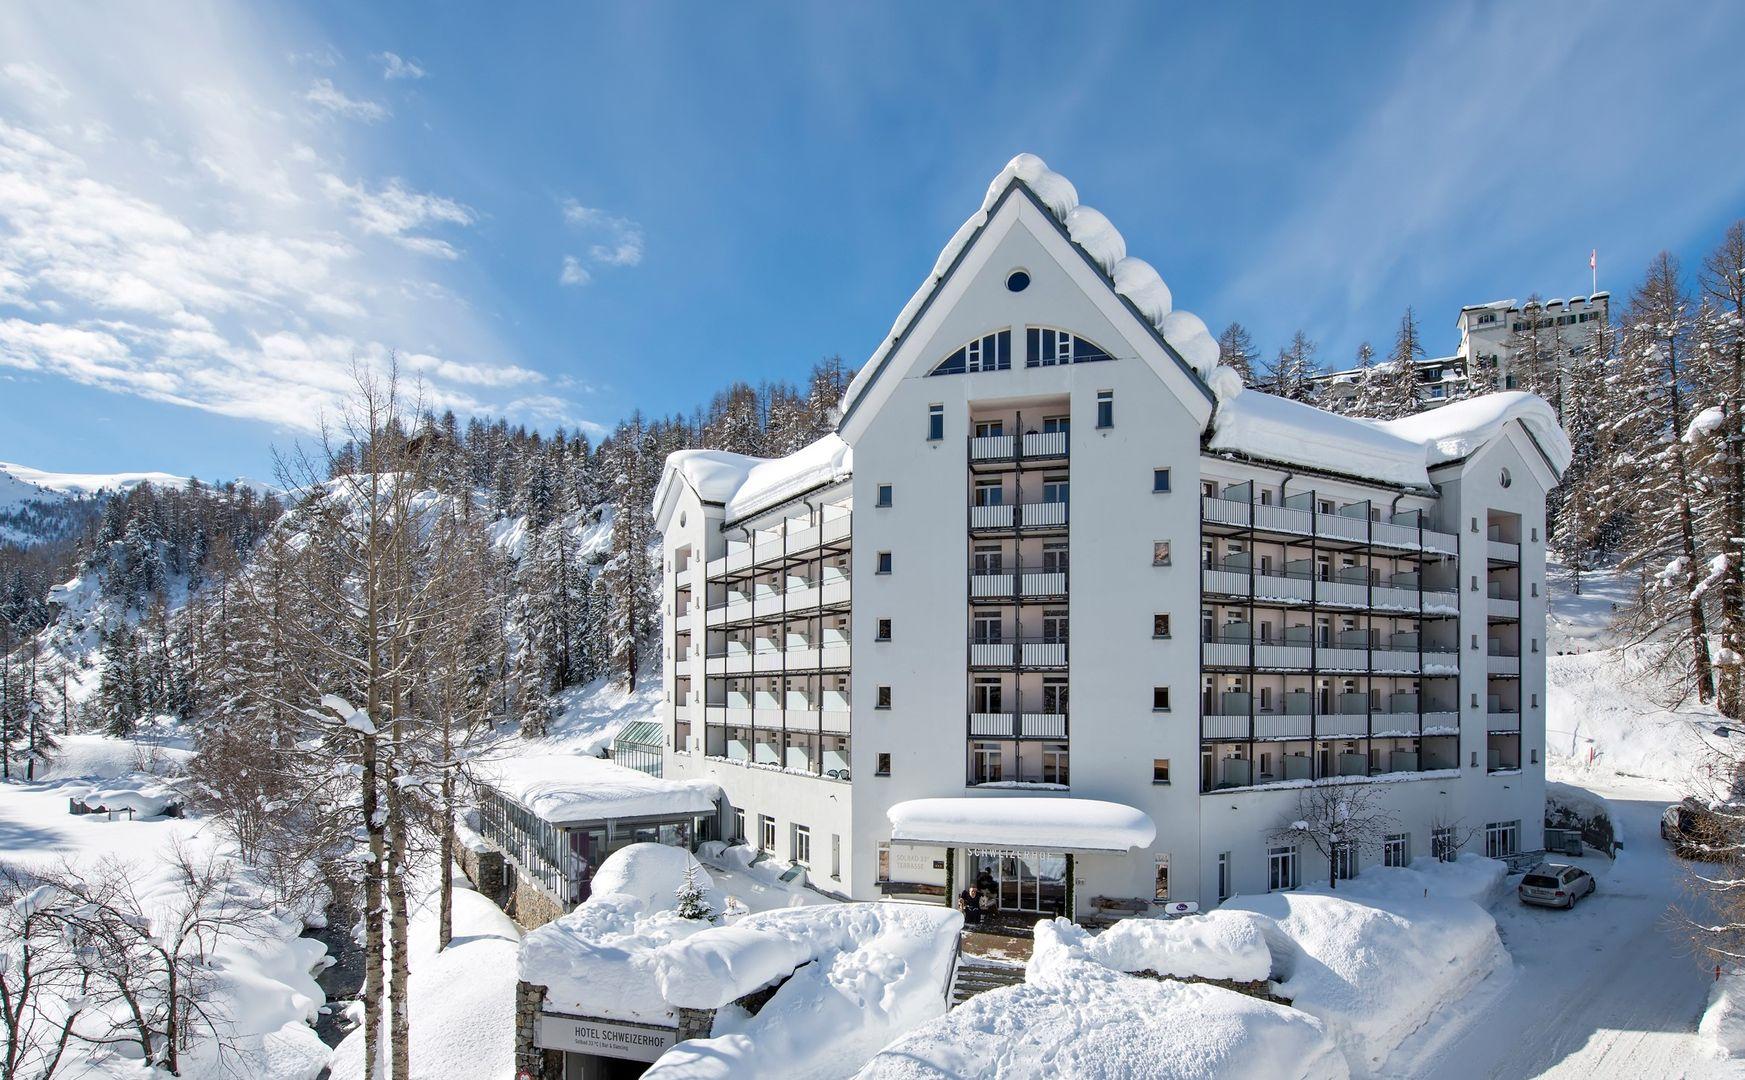 schatzalp snow & mountain resort